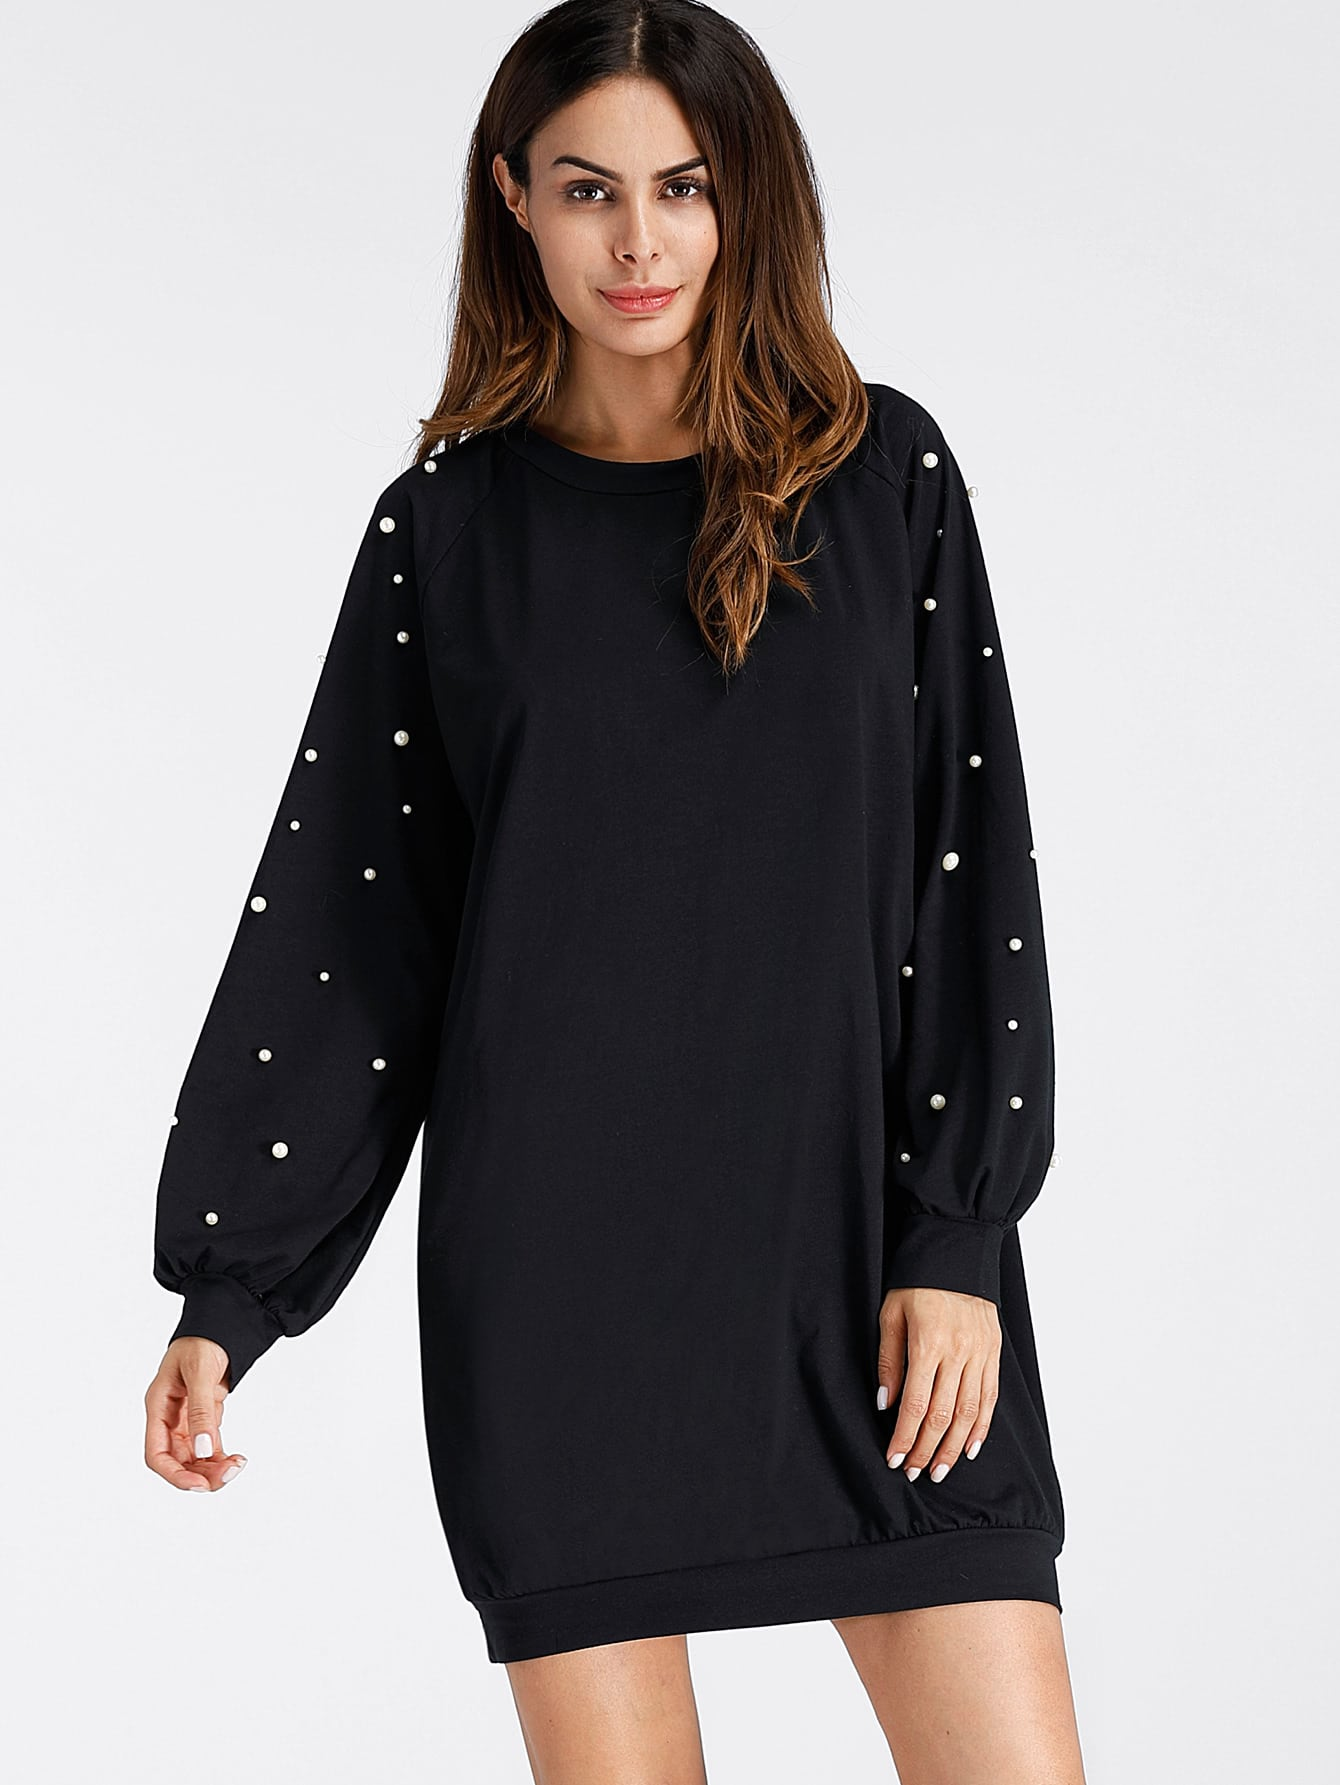 Pearl Beading Raglan Sweatshirt Dress dress171012102